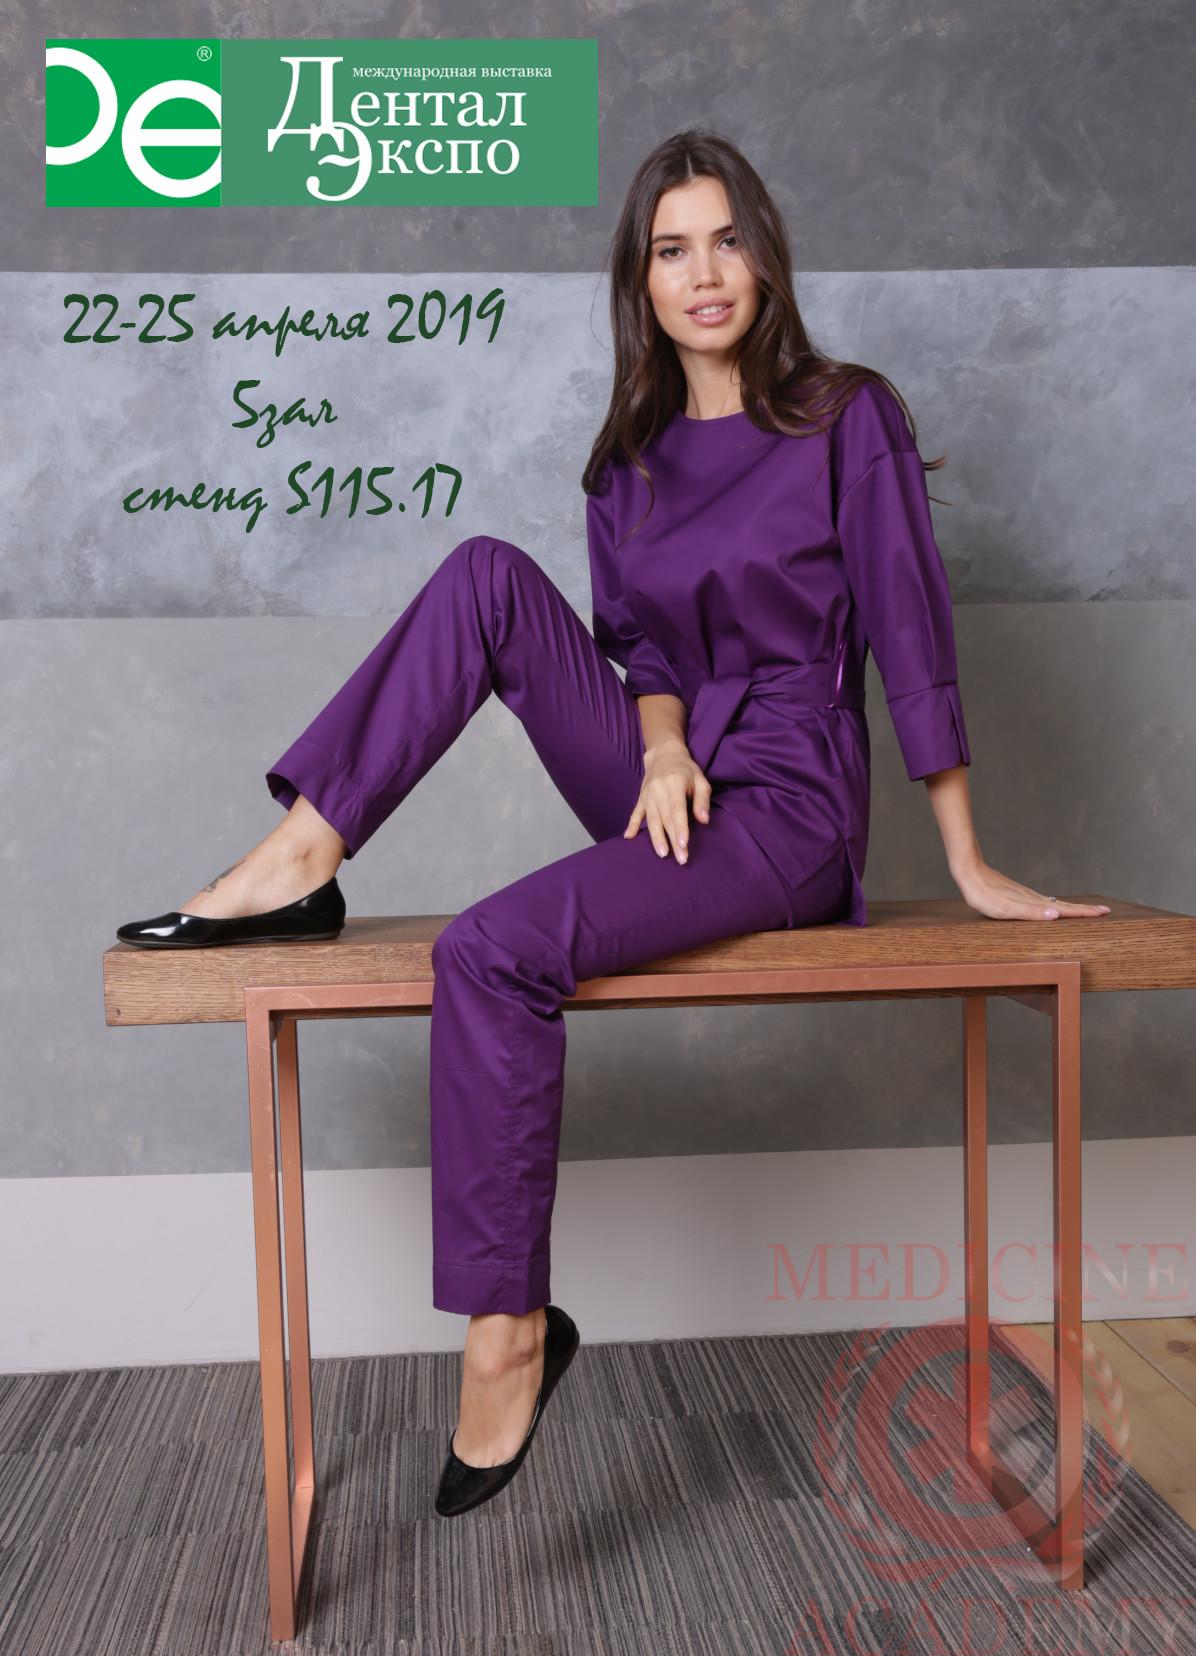 Дентал экспо 22-25 апреля 2019 77ma.ru Medicine-Academy